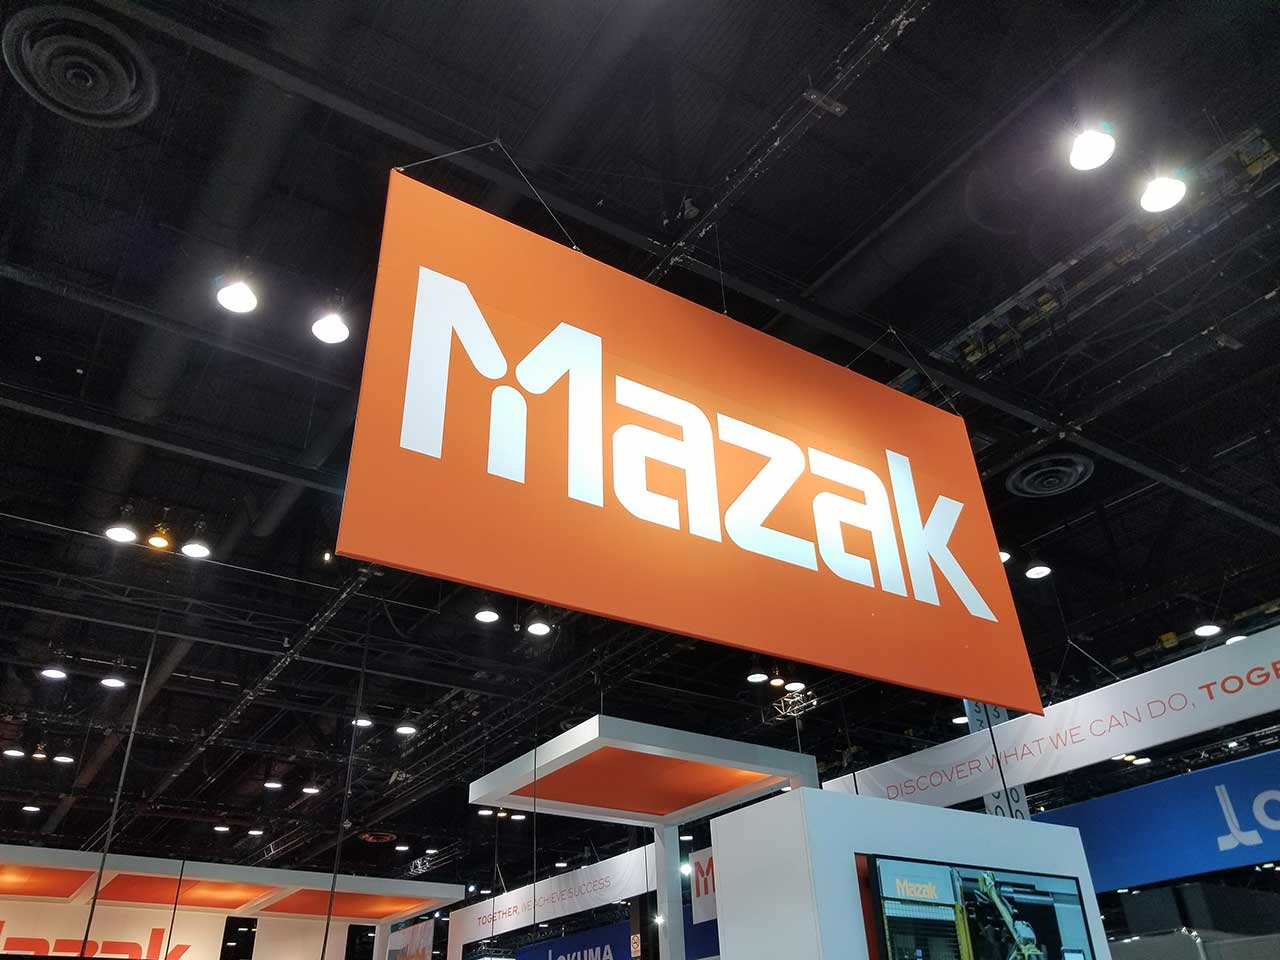 Mazak booth at IMTS 2018